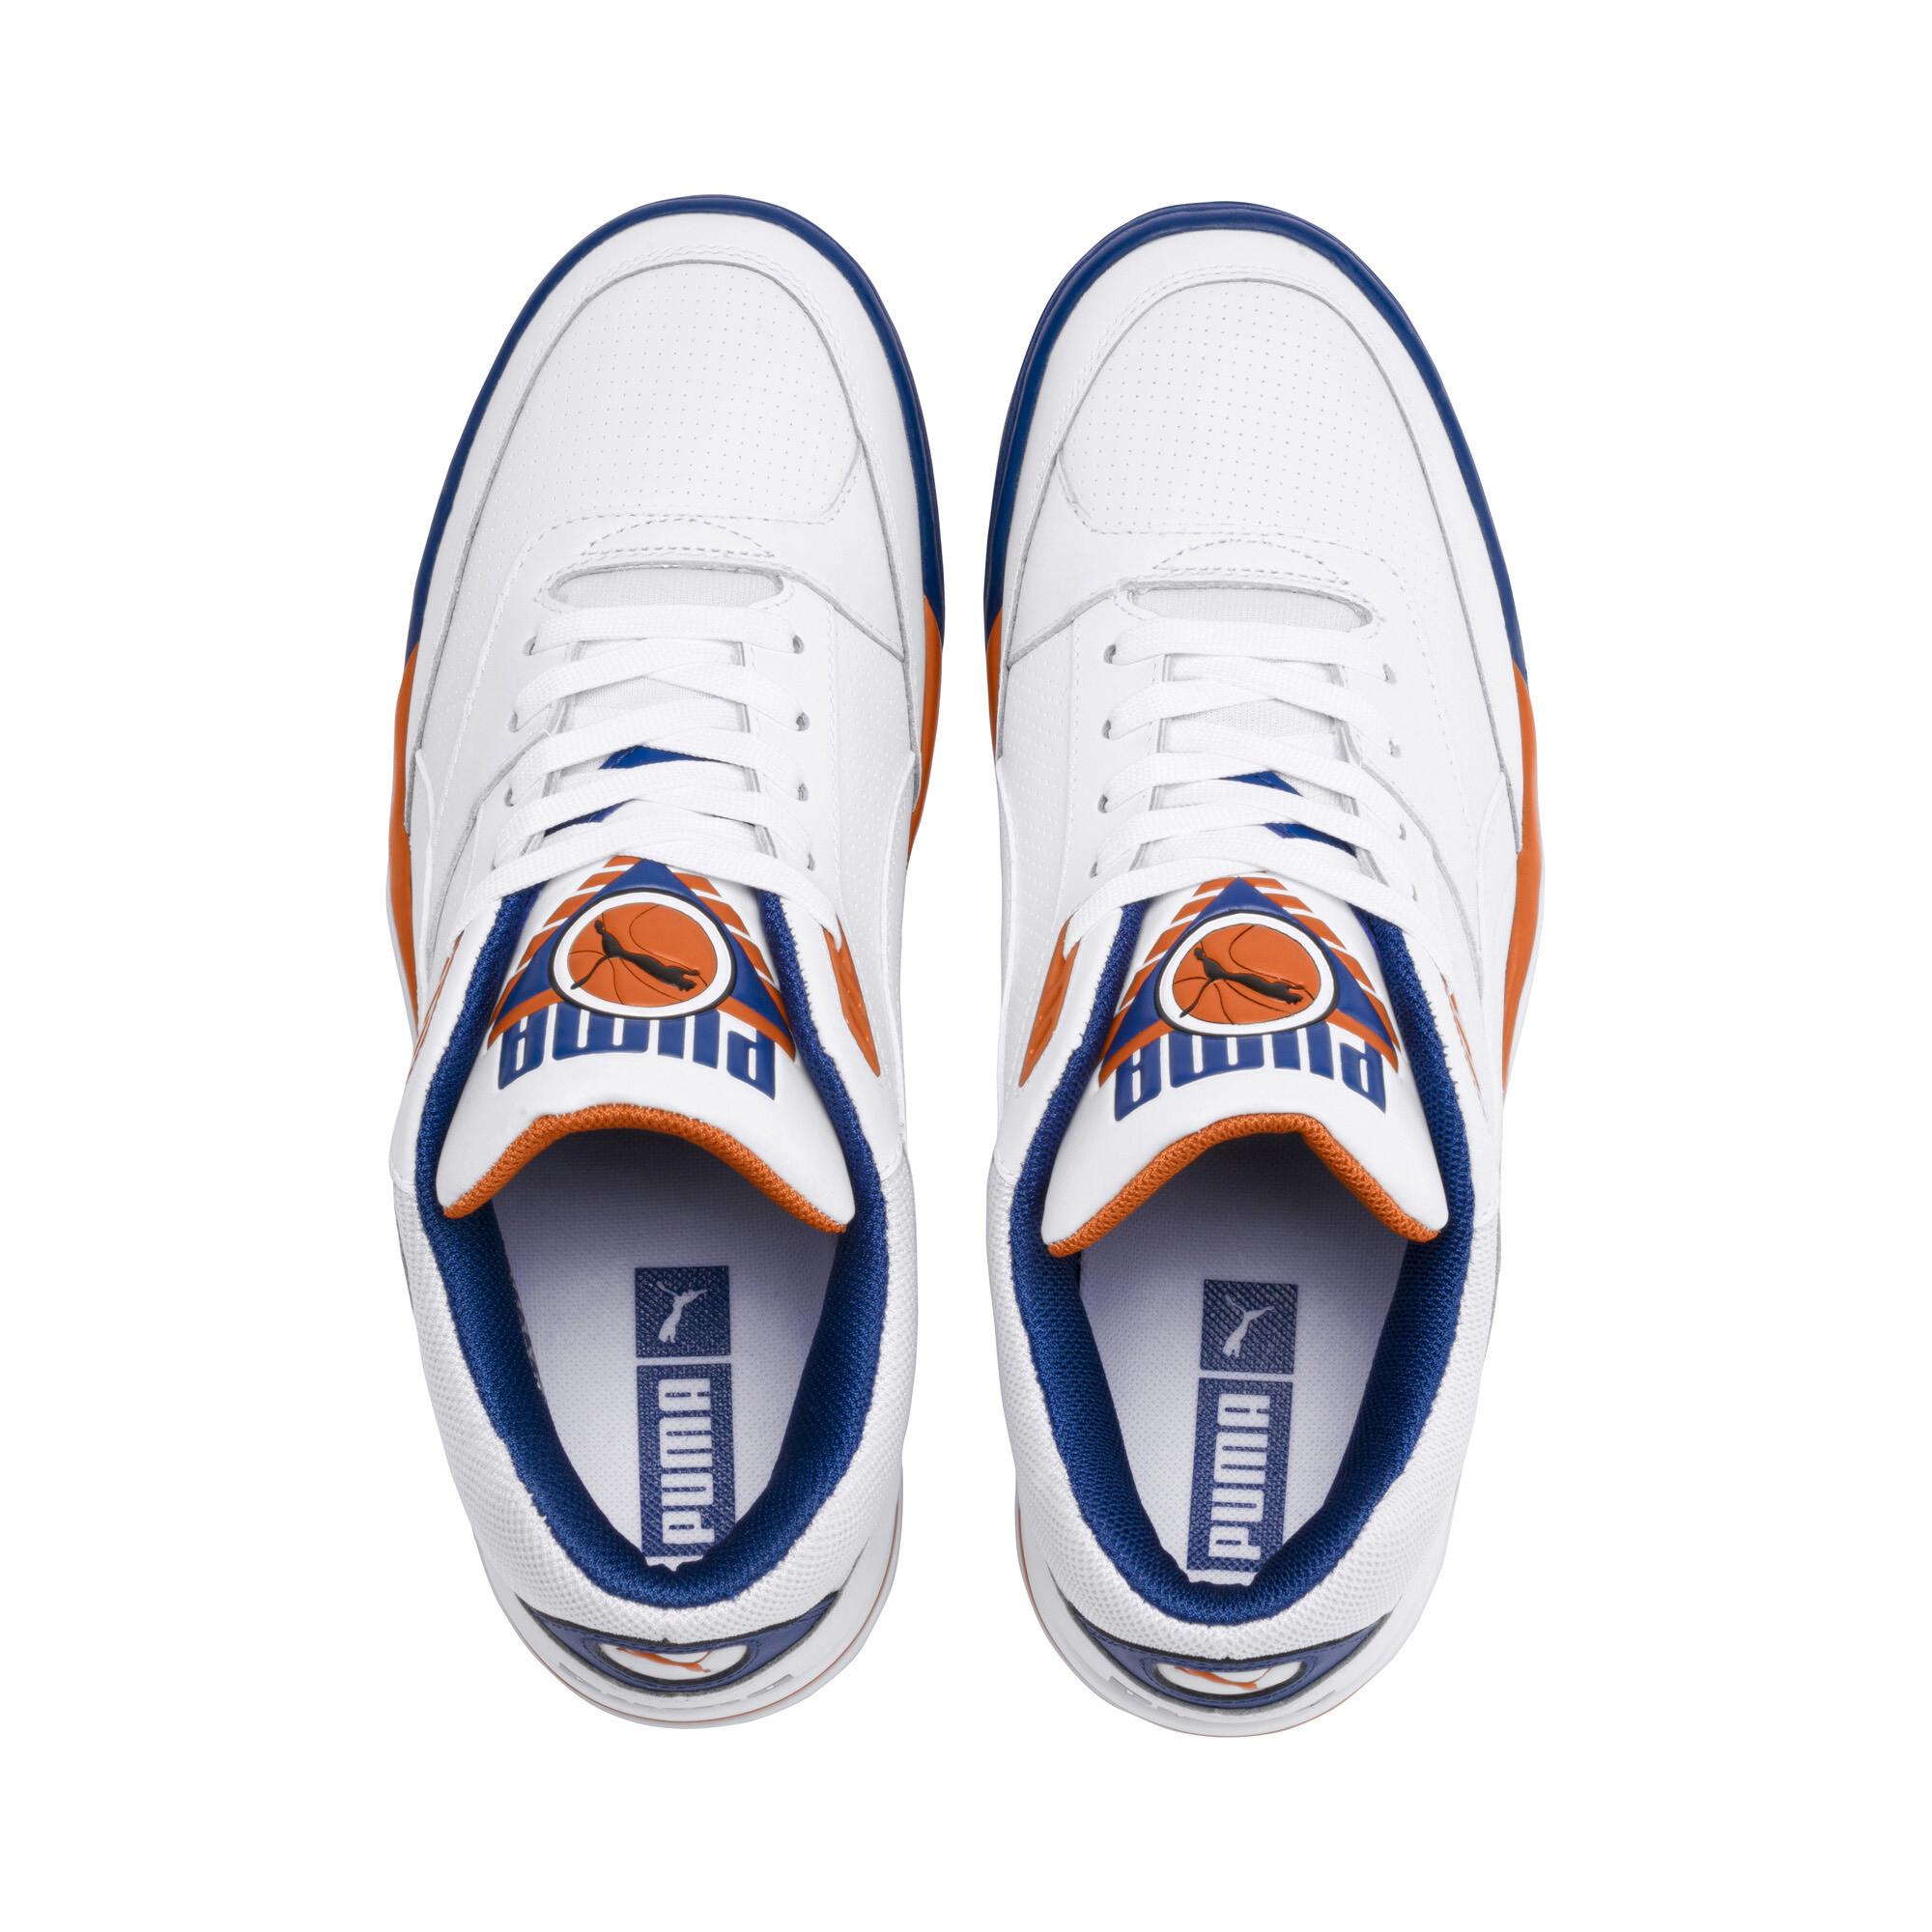 Indexbild 34 - PUMA Palace Guard Sneaker Unisex Schuhe Sport Classics Neu